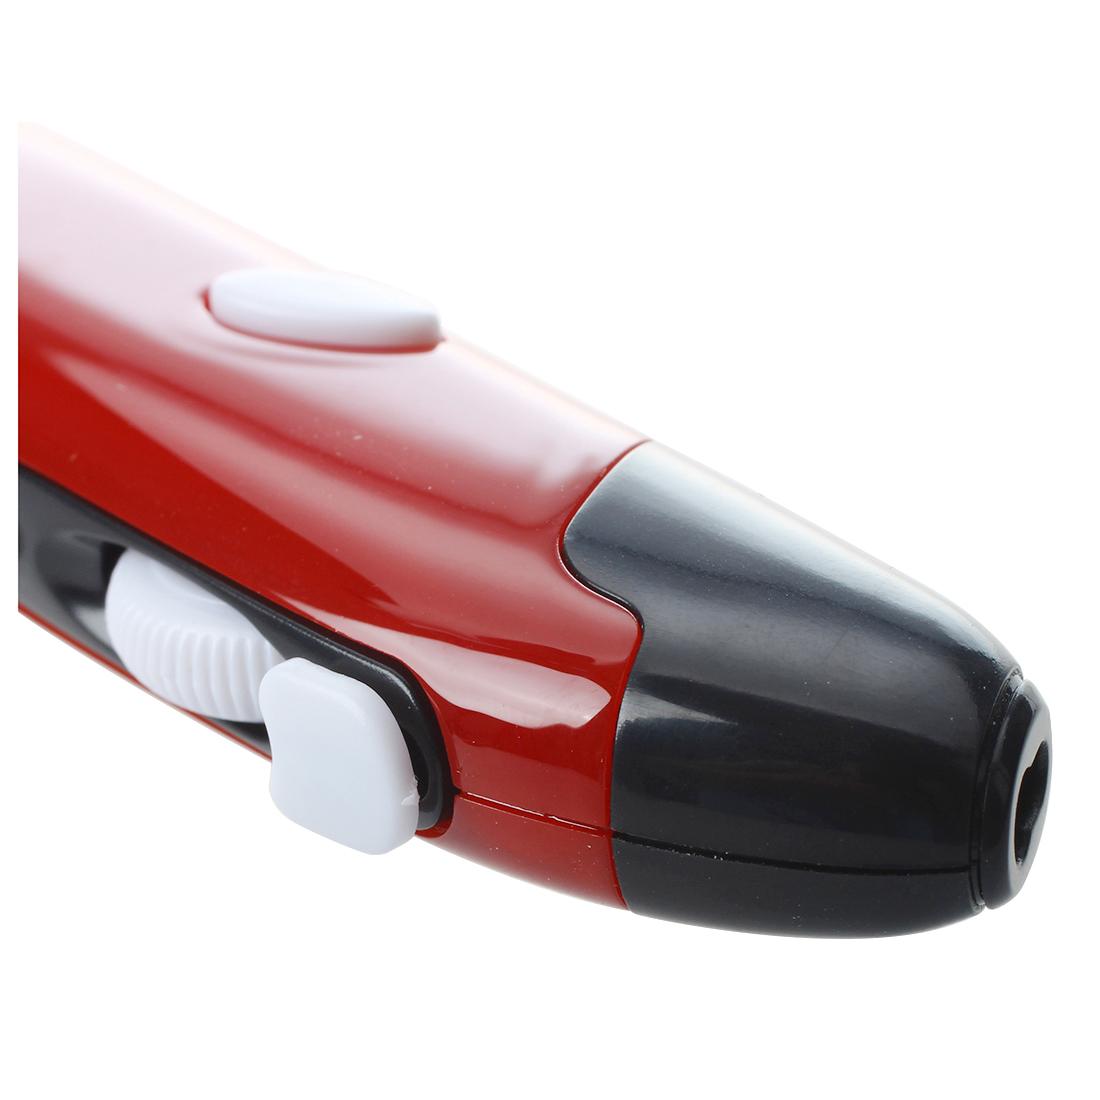 rouge 2 4g 2 4ghz forme de stylo souris optique sans fil. Black Bedroom Furniture Sets. Home Design Ideas